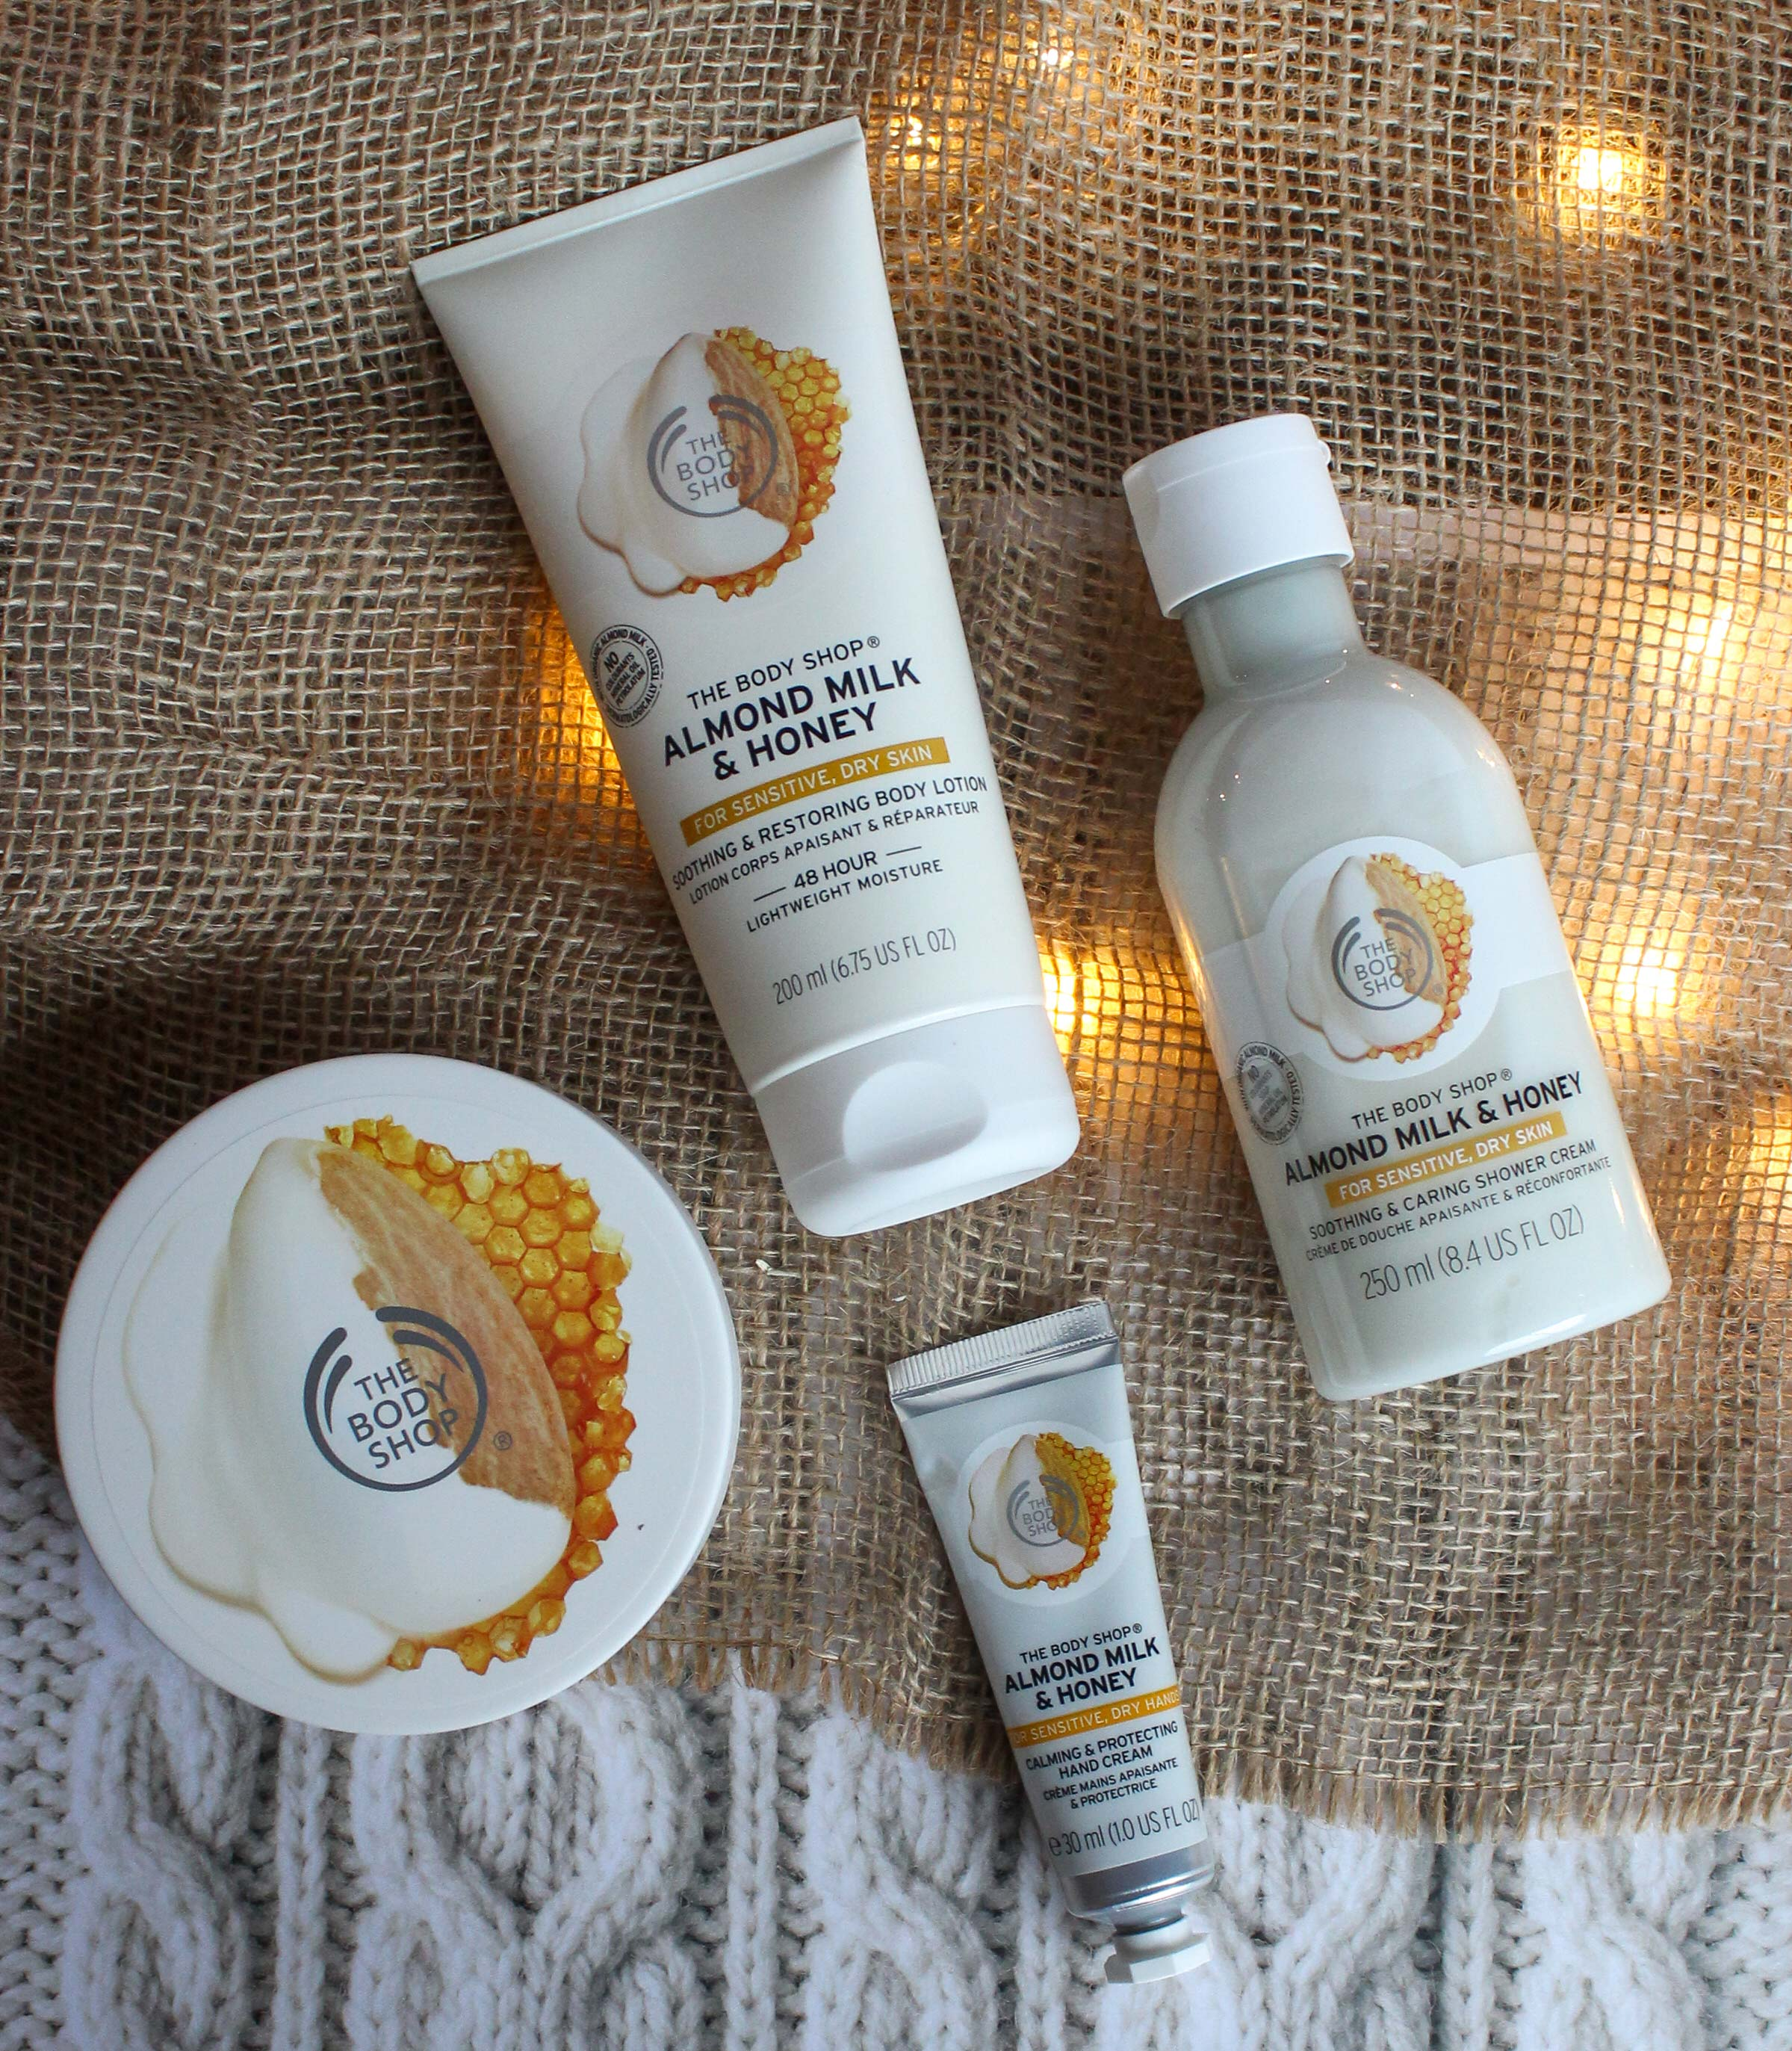 The Body Shop Almond Milk & Honey Gift Ideas